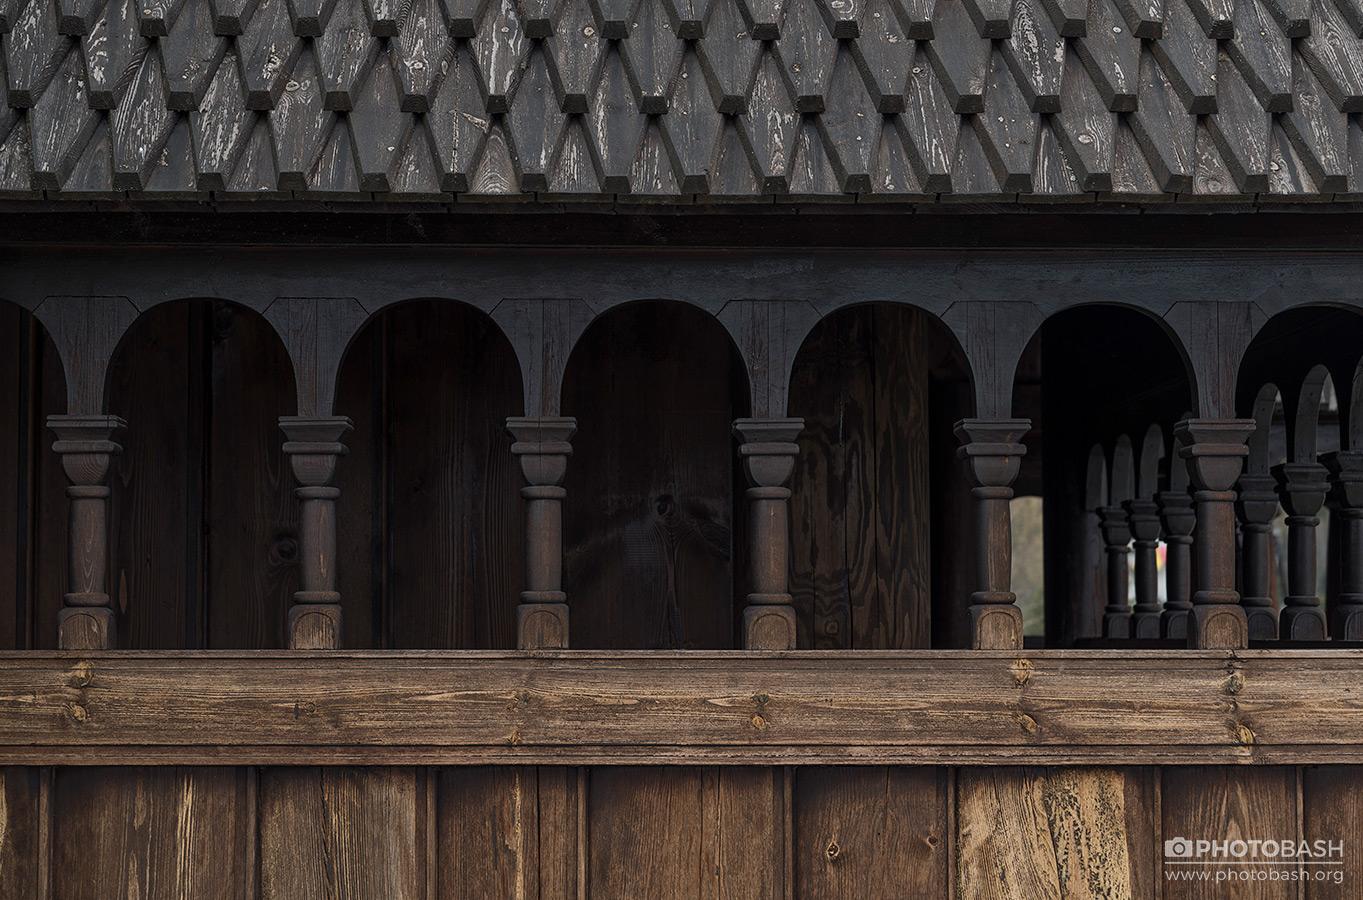 Viking-Architecture-Stave-Window-Arches.jpg